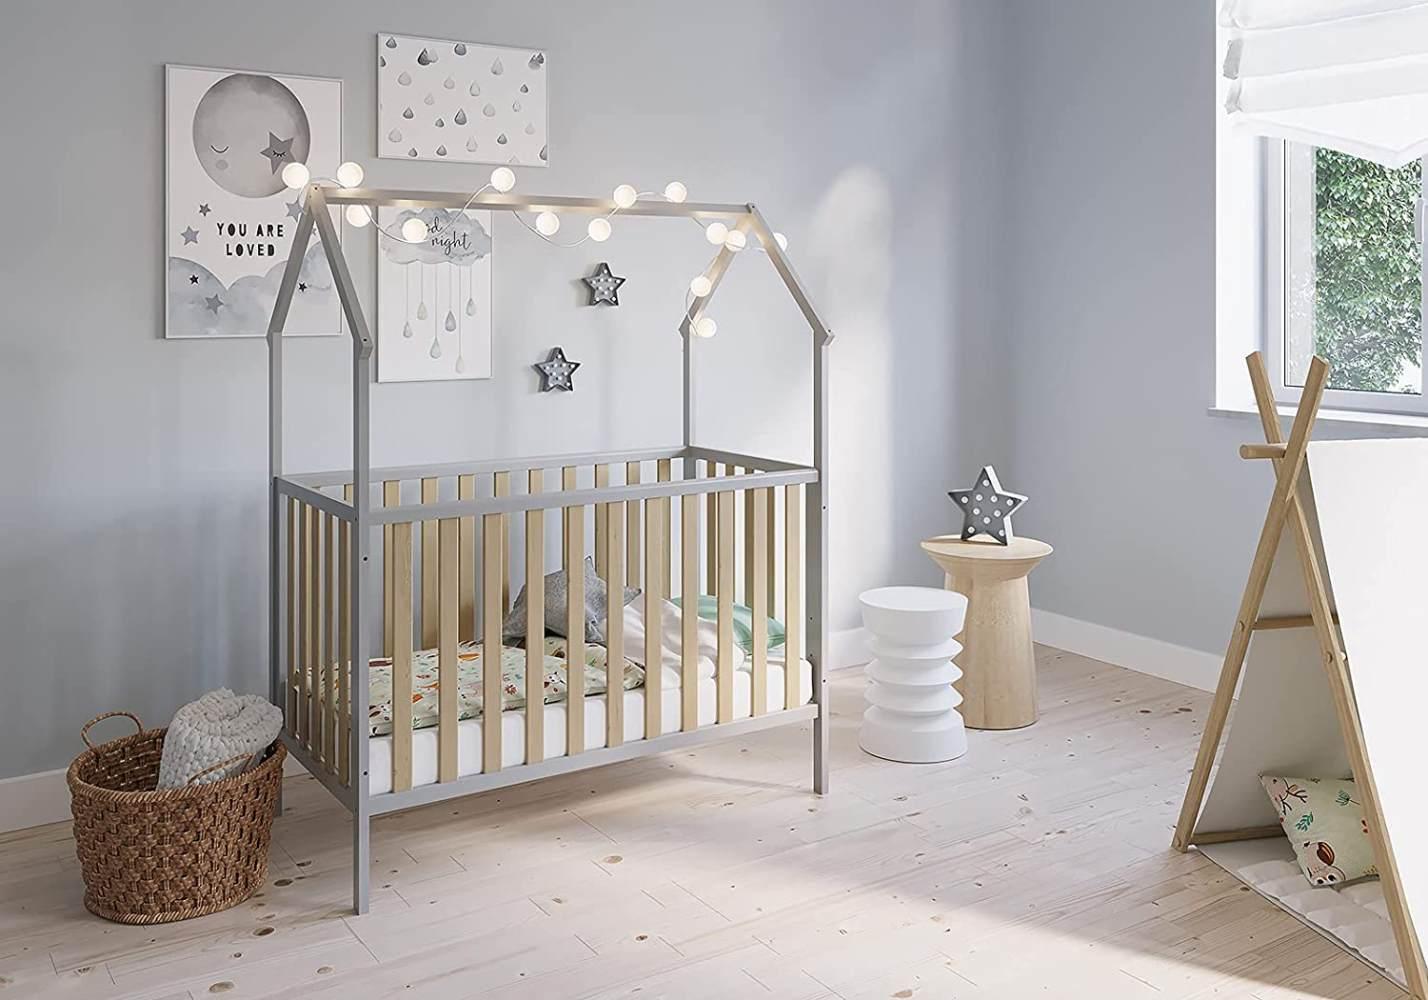 FabiMax 'Schlafmütze' Kinderbett, 60 x 120 cm, grau/natur, mit Matratze Classic, Kiefer massiv, 3-fach höhenverstellbar, umbaubar Bild 1